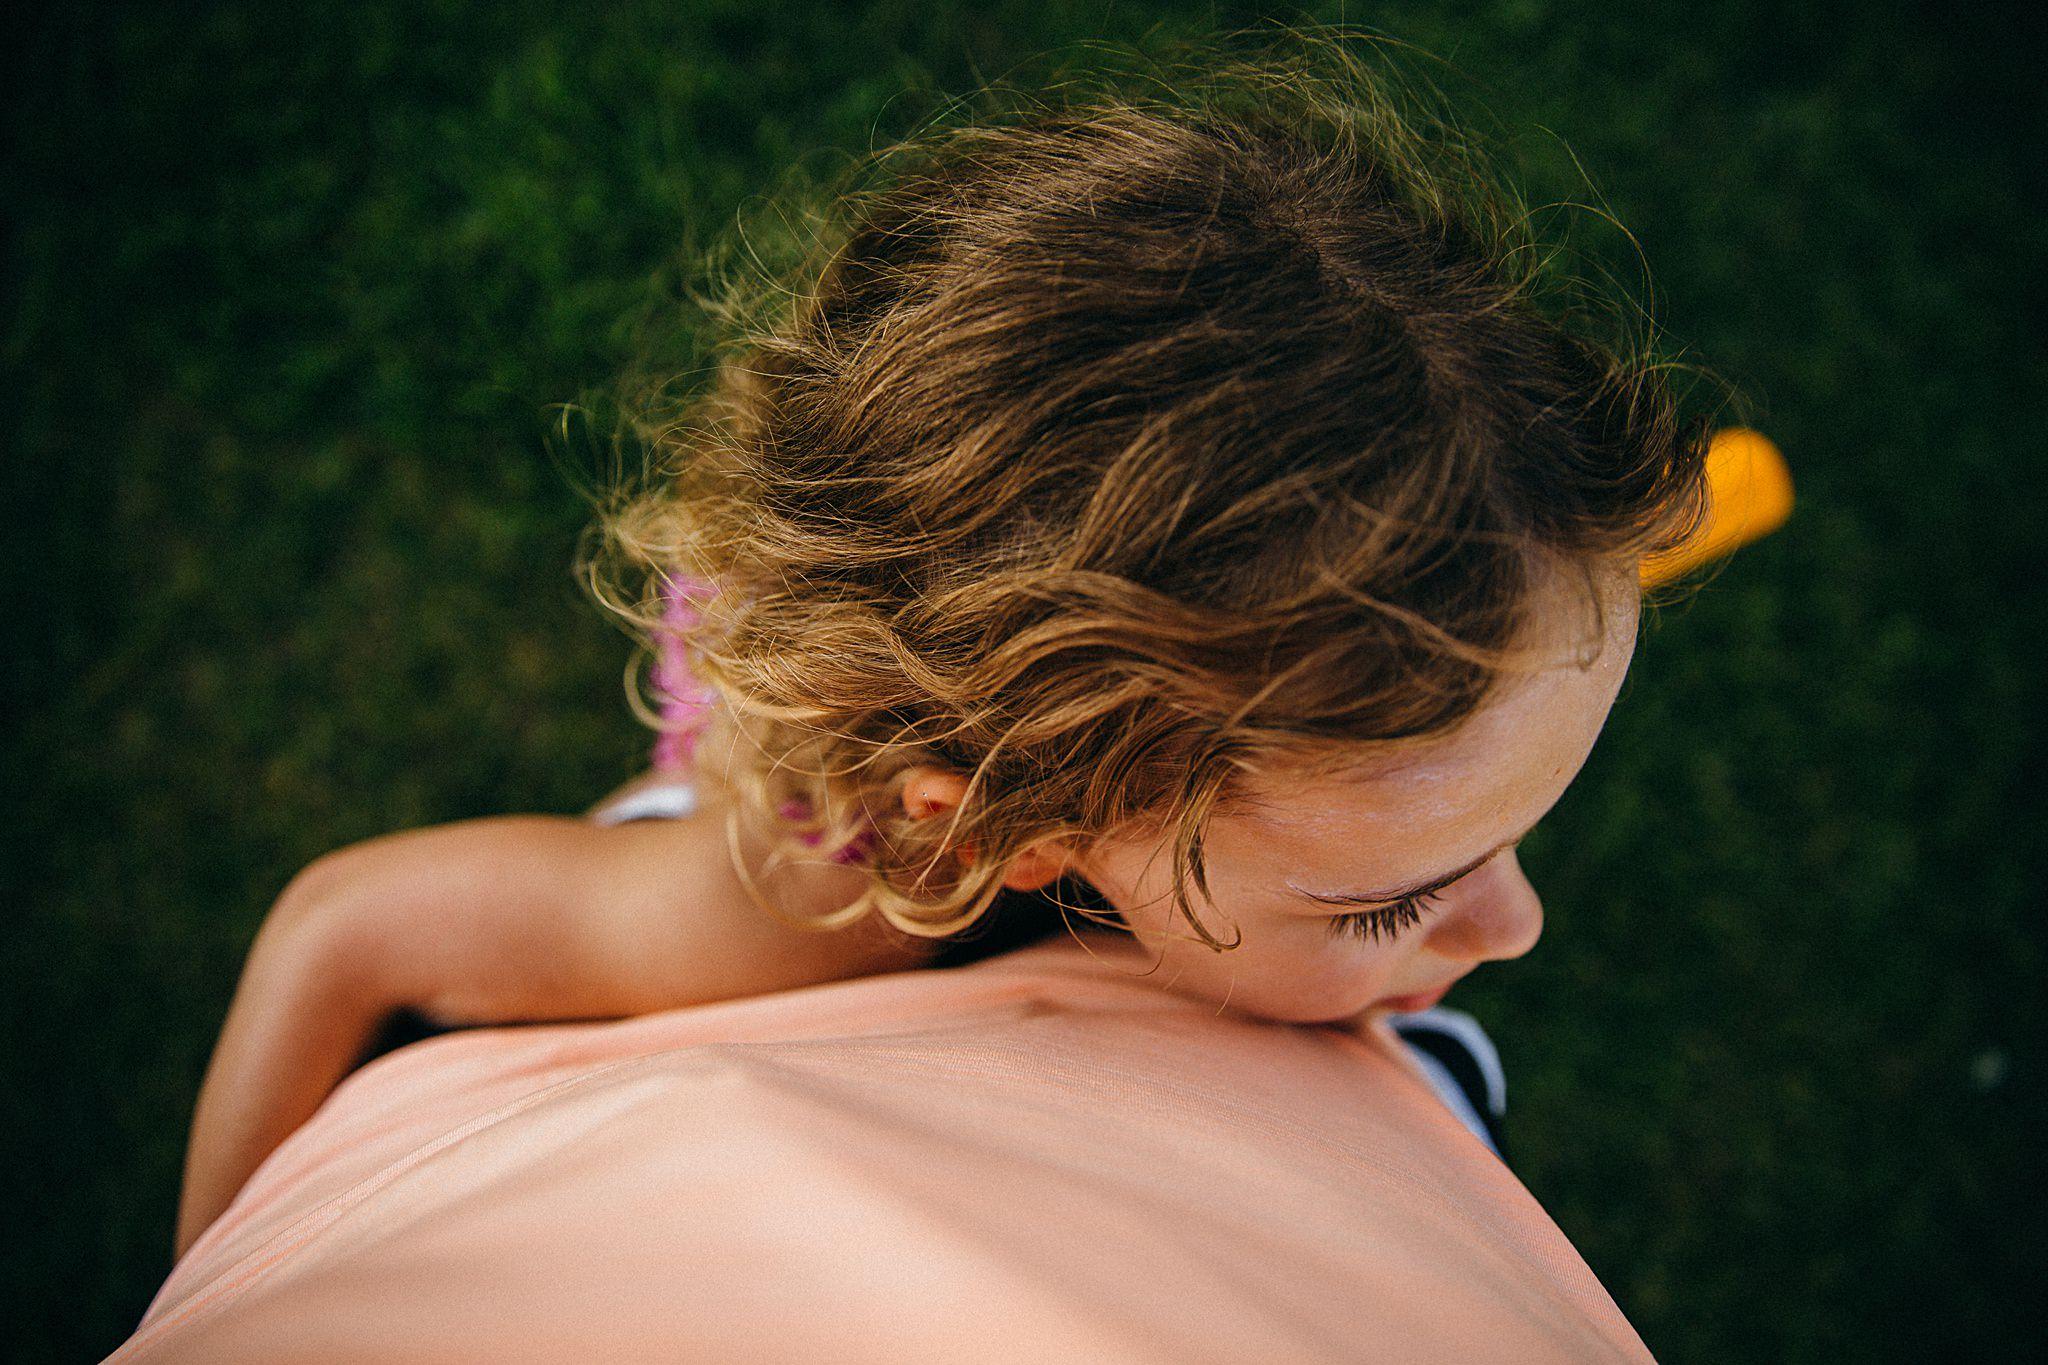 backyard-summer-playtime-with-cousins_0036.jpg